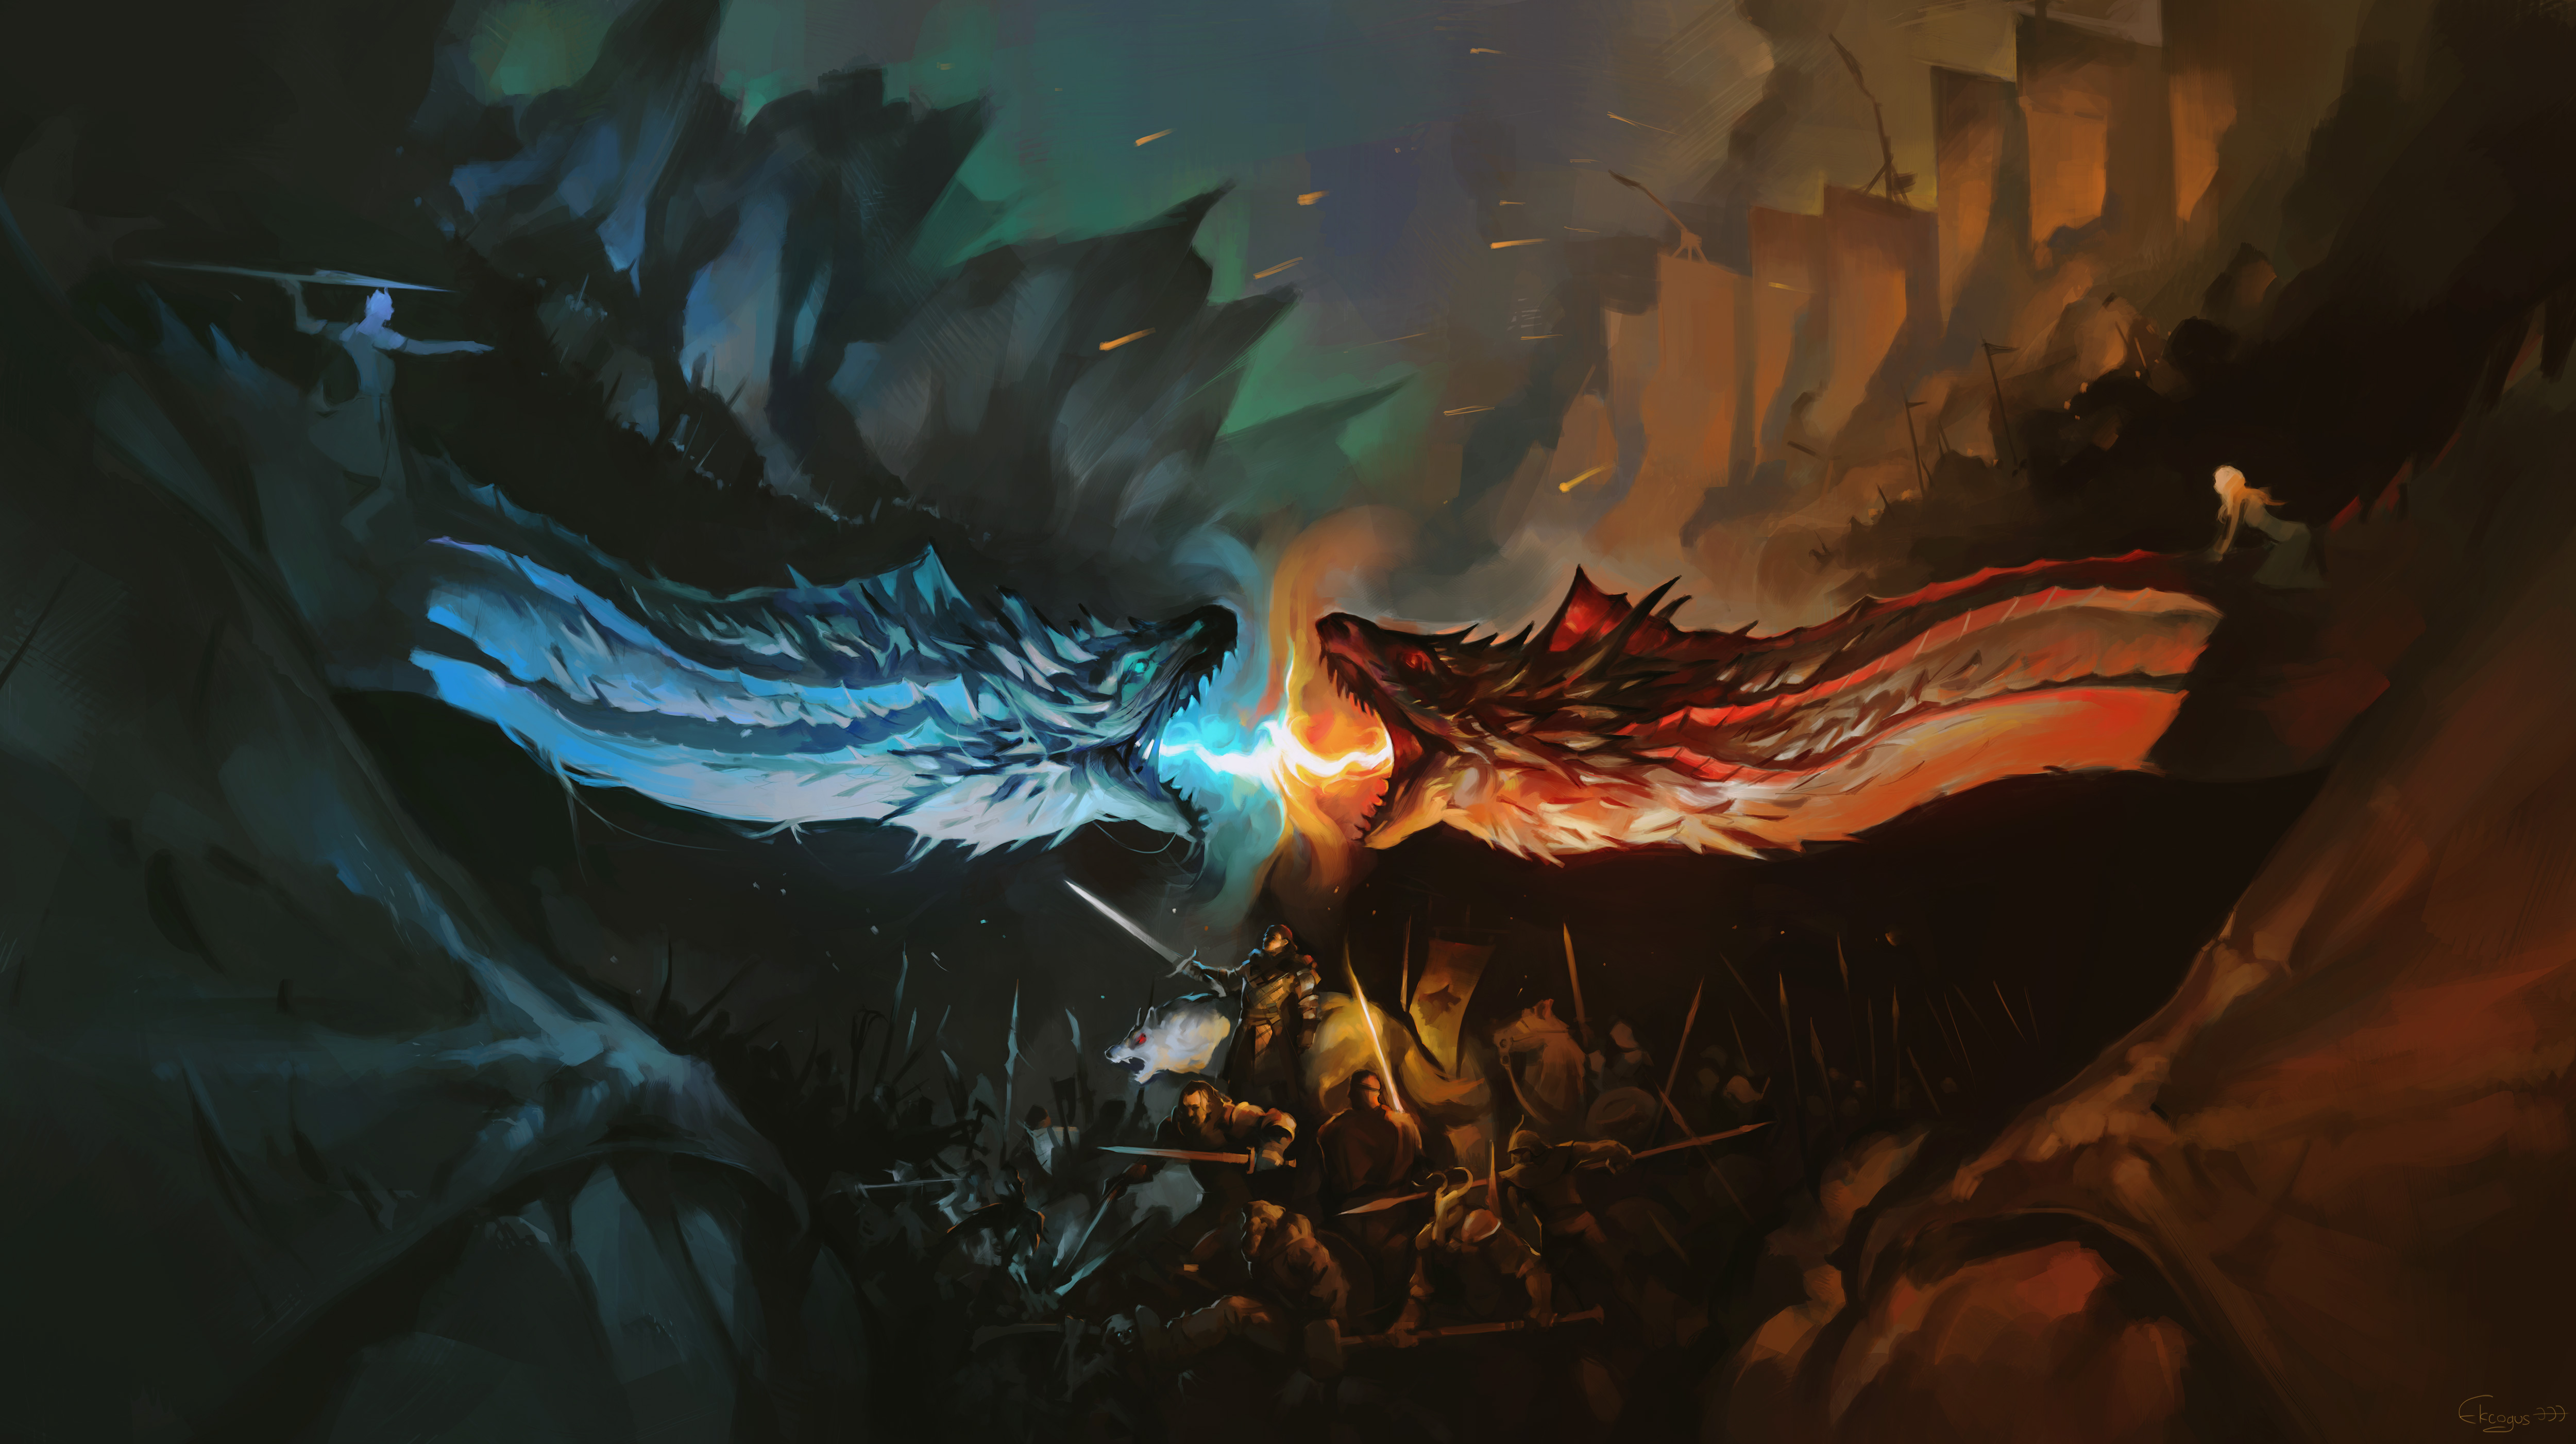 Download Wallpaper Night Dragon - night-king-and-khaleesi-fighting-with-dragons-artwork-na  Snapshot.jpg